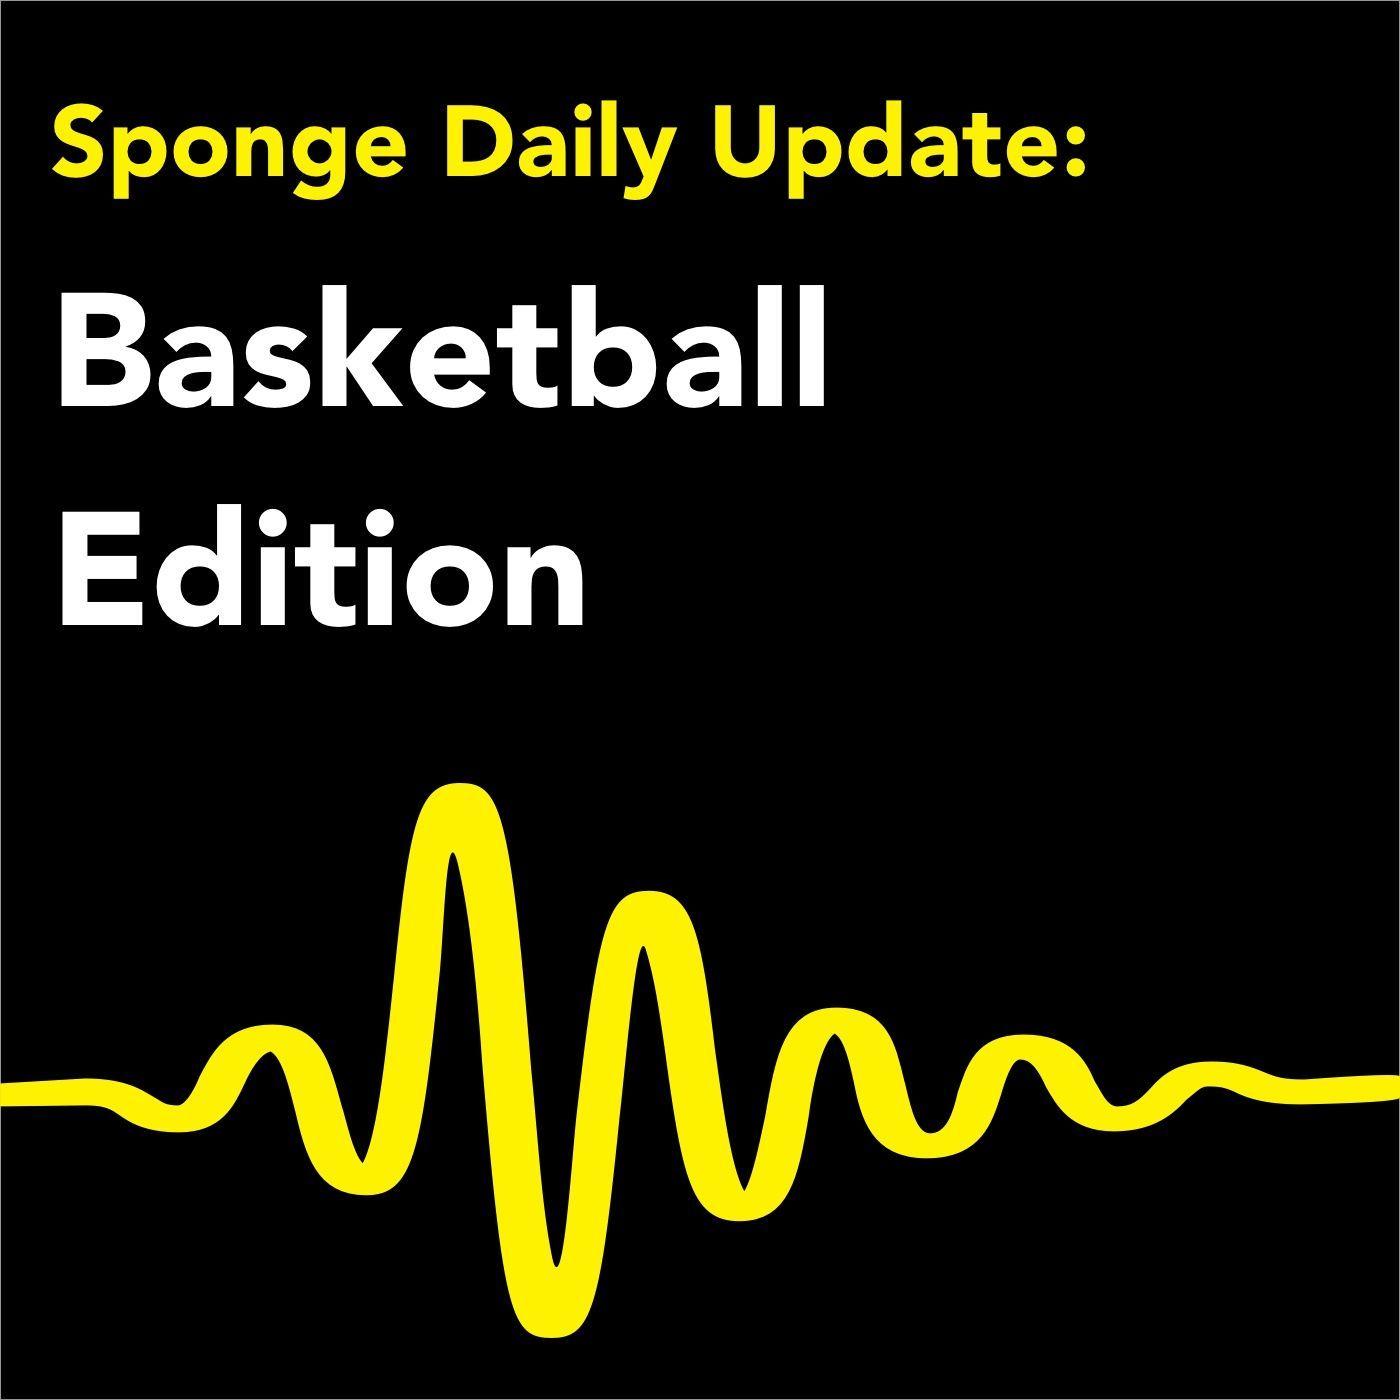 Following Thompson-Green kerfuffle, unwritten rules make appearance in NBA Finals | FOX Sports